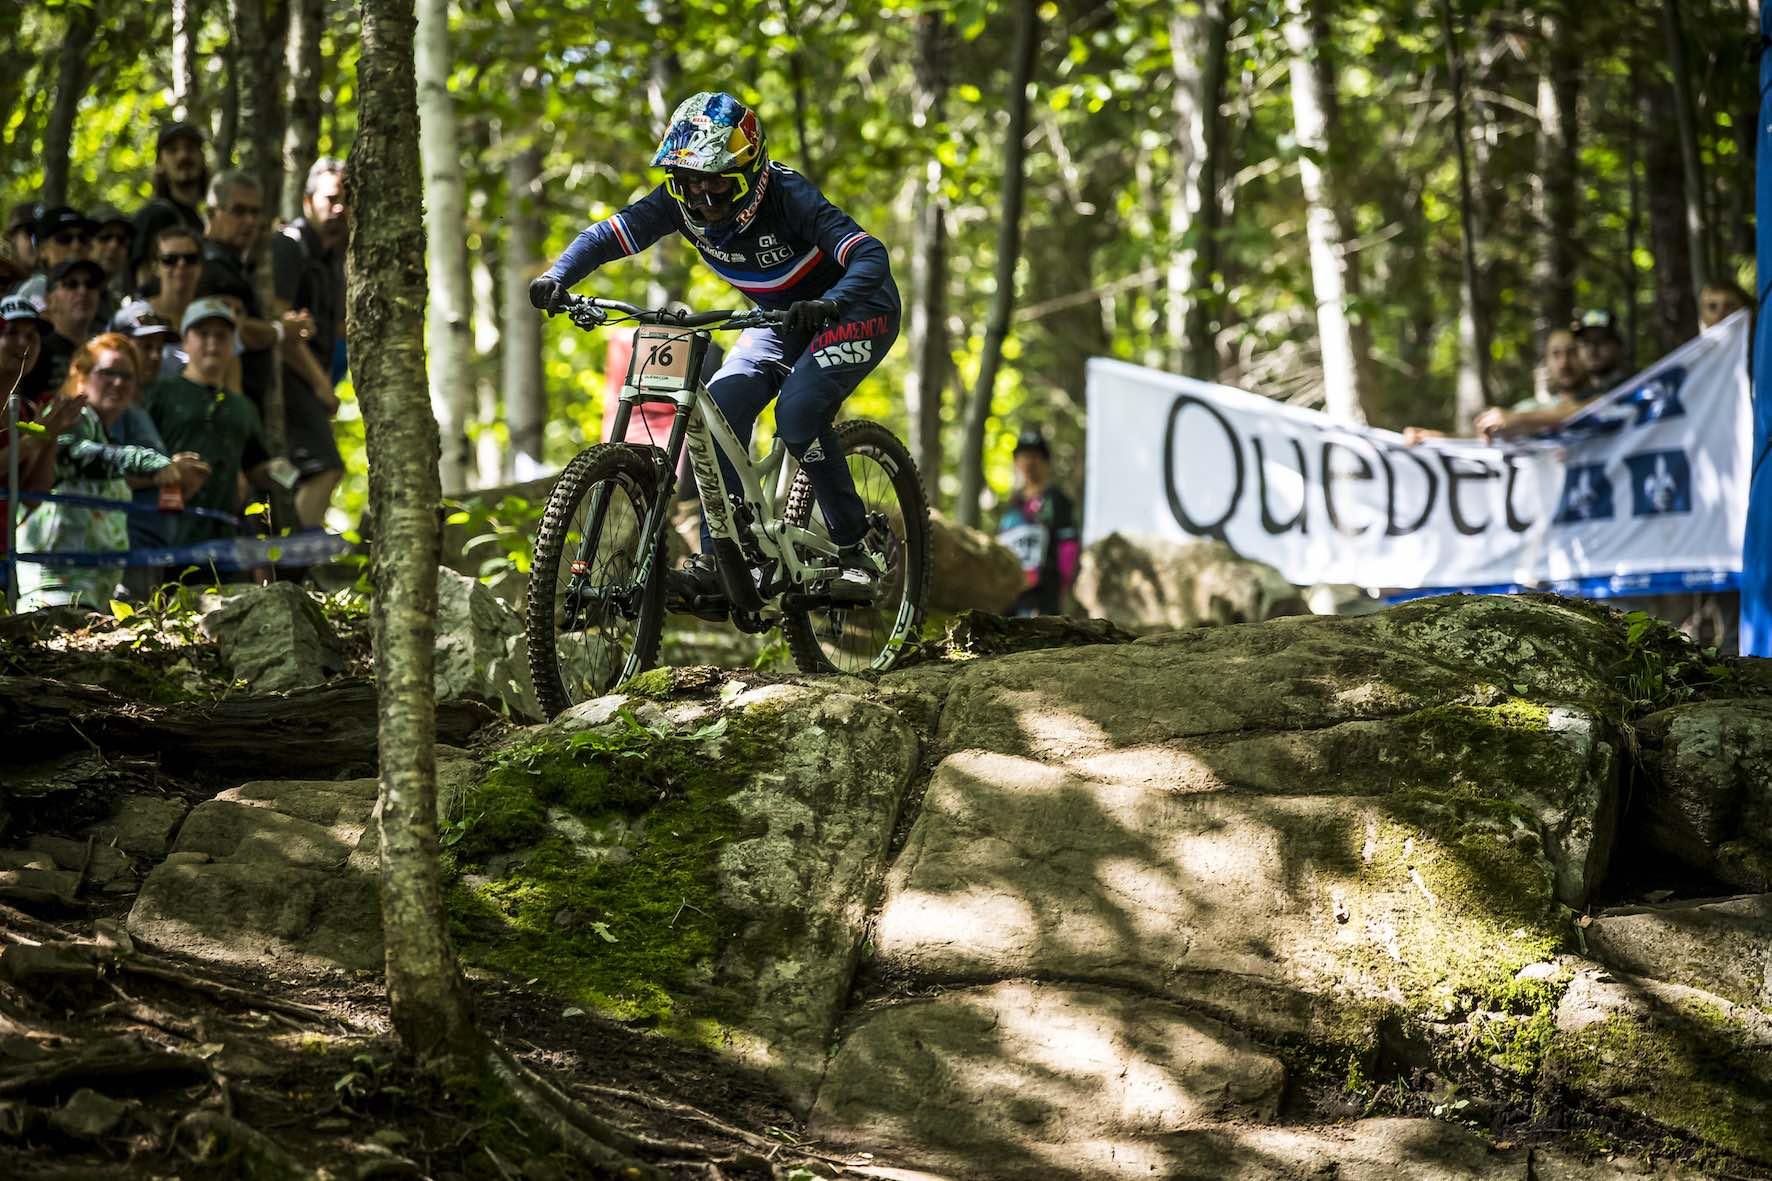 Myriam Nicole racing the 2019 UCI Downhill MTB World Championship in Mont-Sainte-Anne